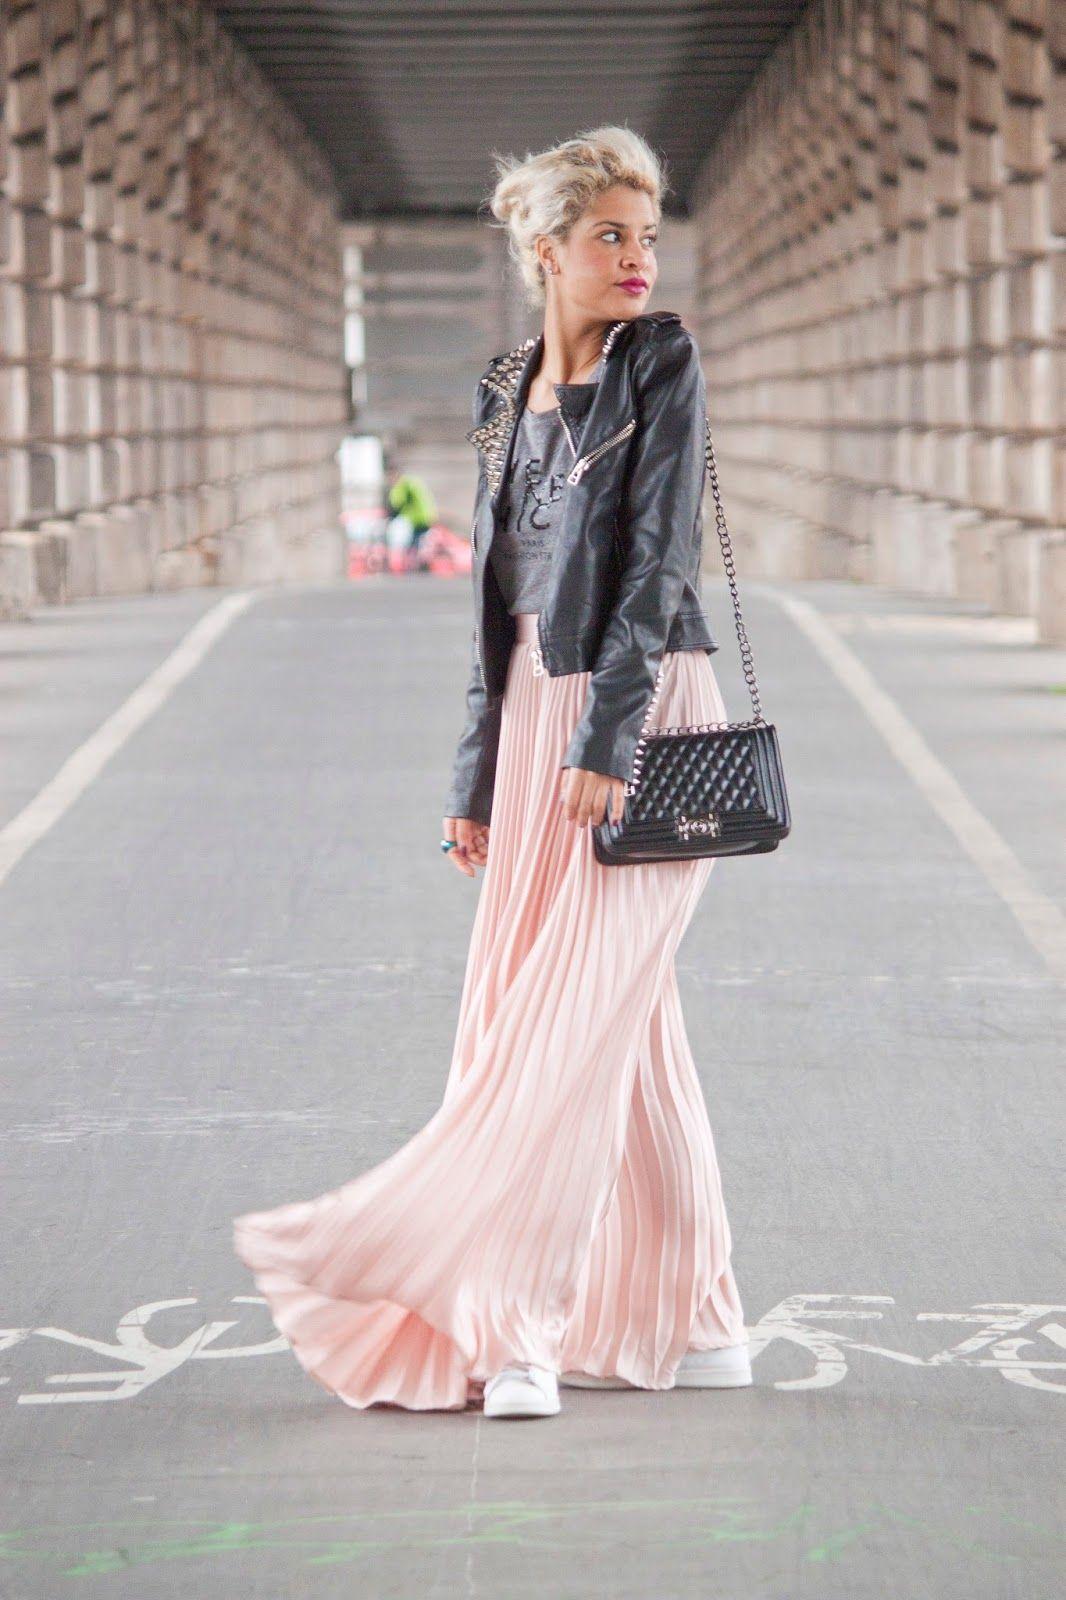 jupe longue pliss e rose clothing pinterest jupe longue pliss e jupes longues et jupes. Black Bedroom Furniture Sets. Home Design Ideas